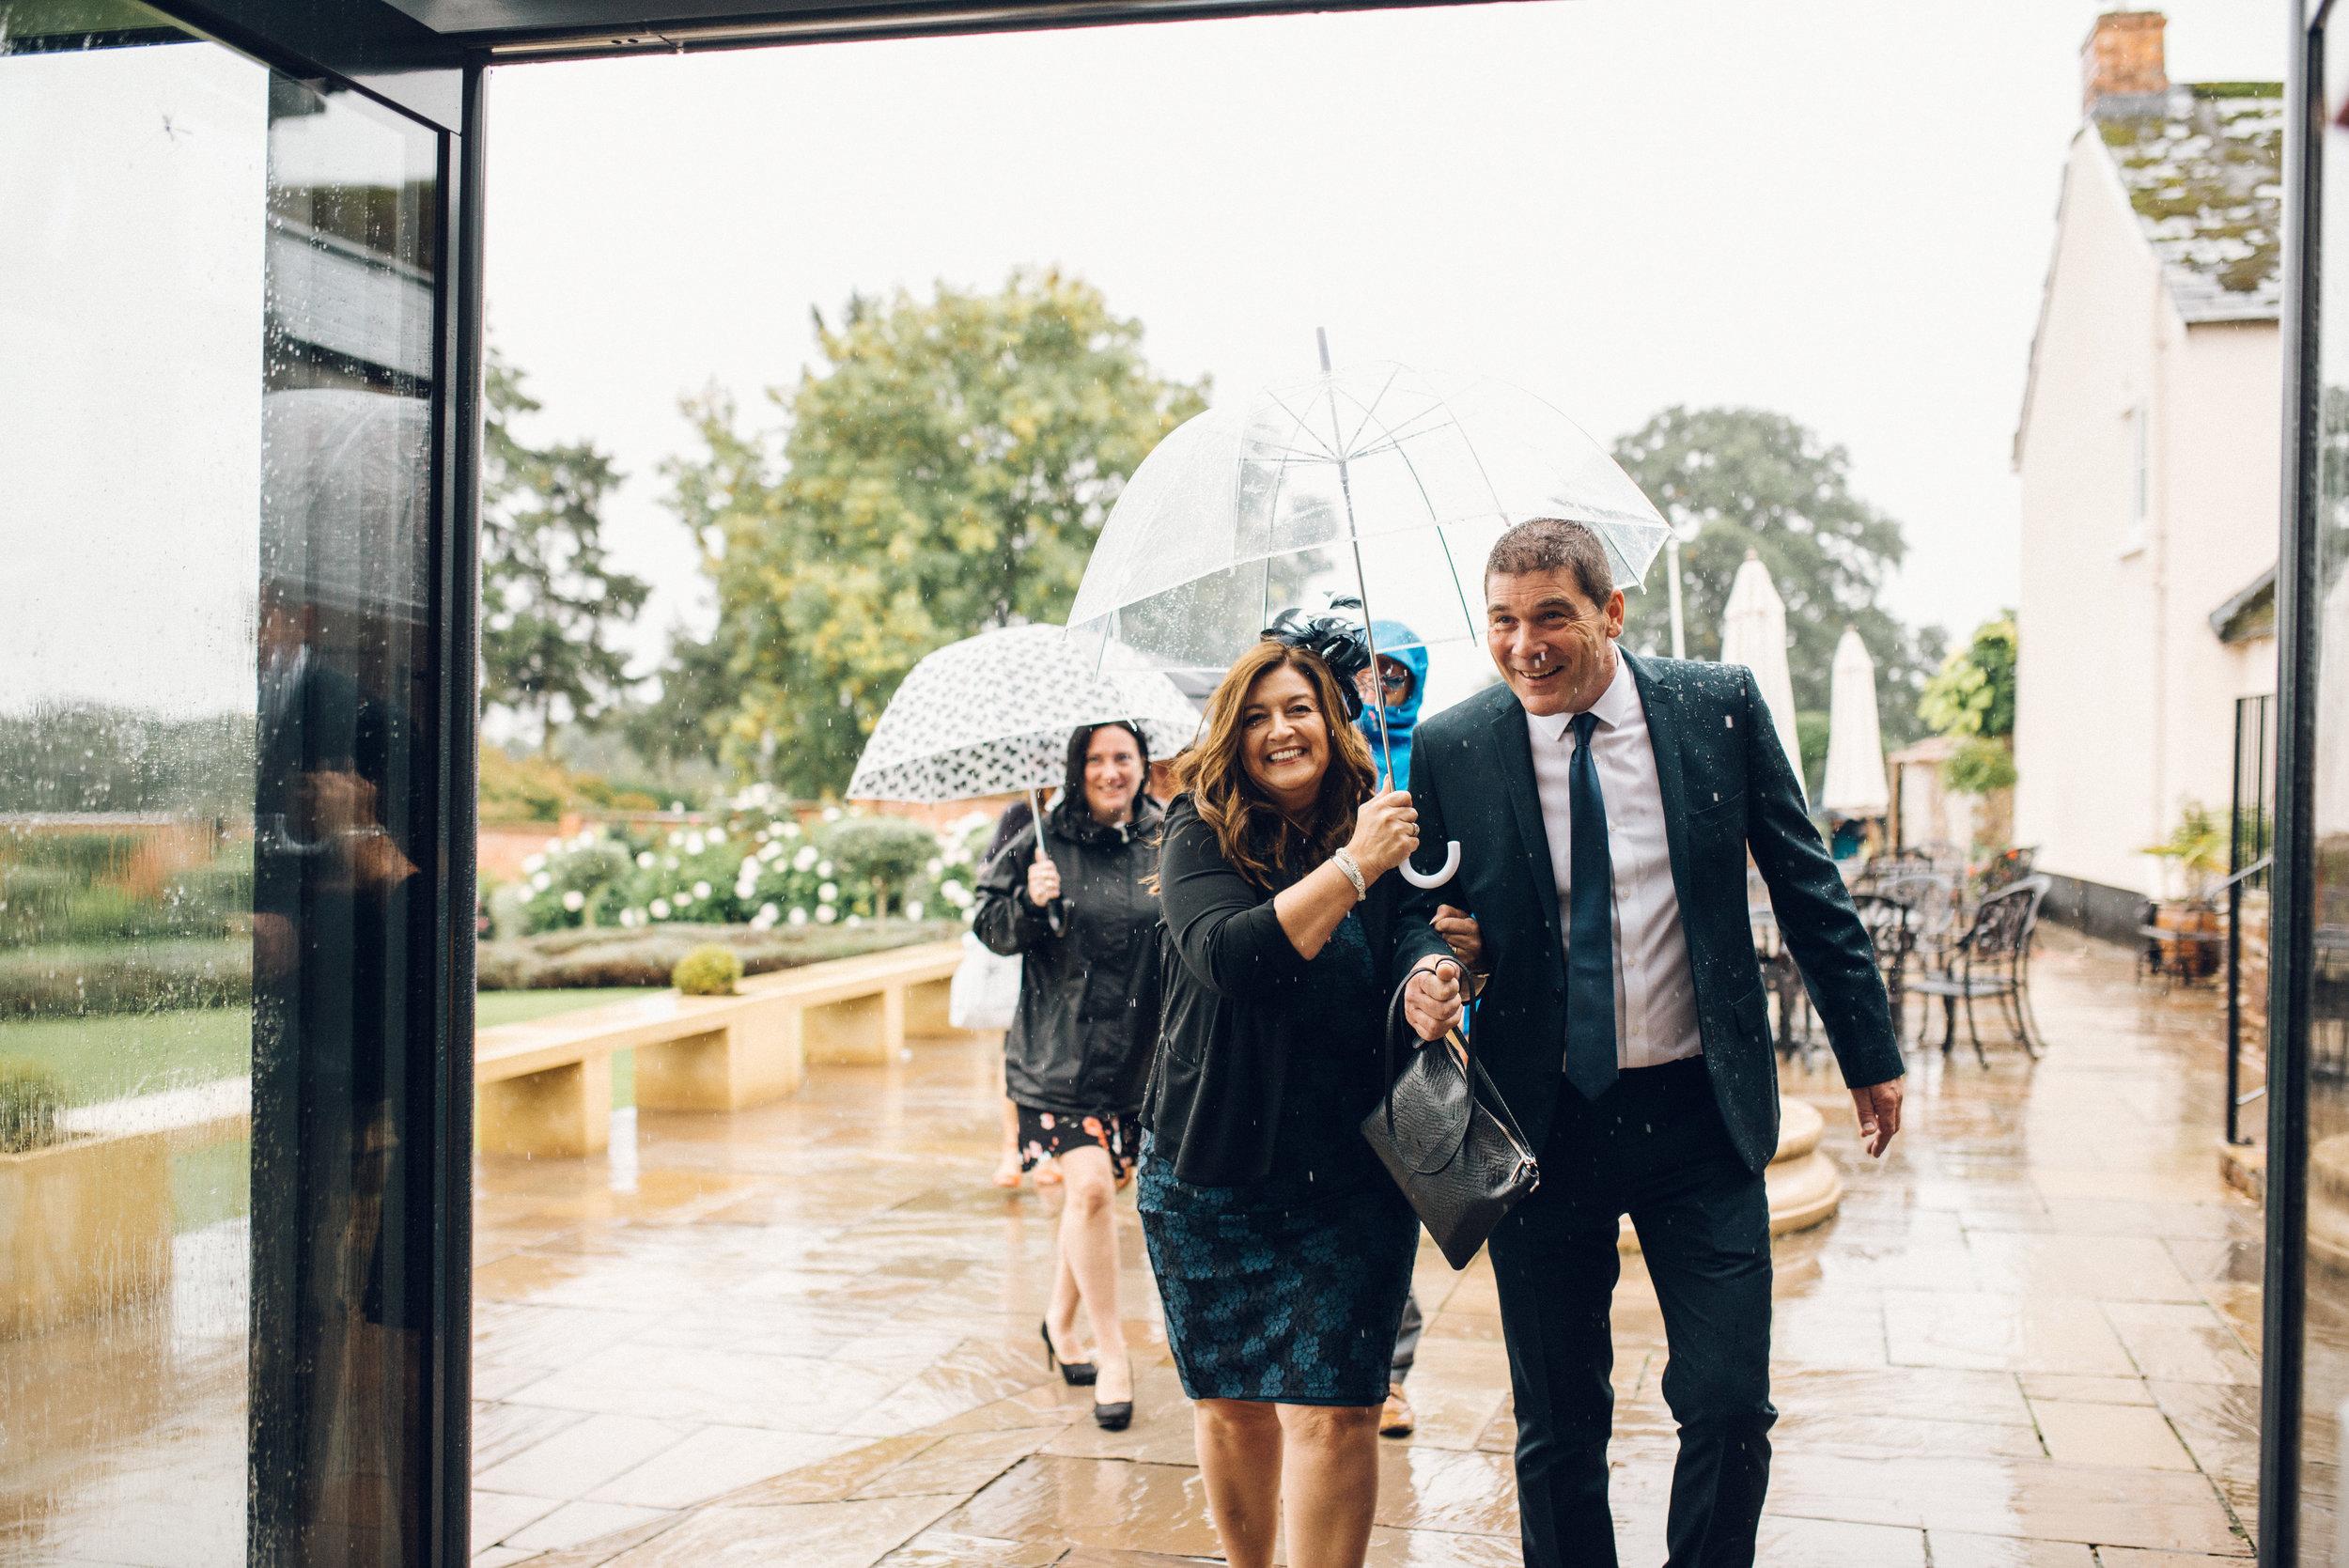 Rainy wedding at Upton Barn and Walled Garden - Chloe Lee Photo